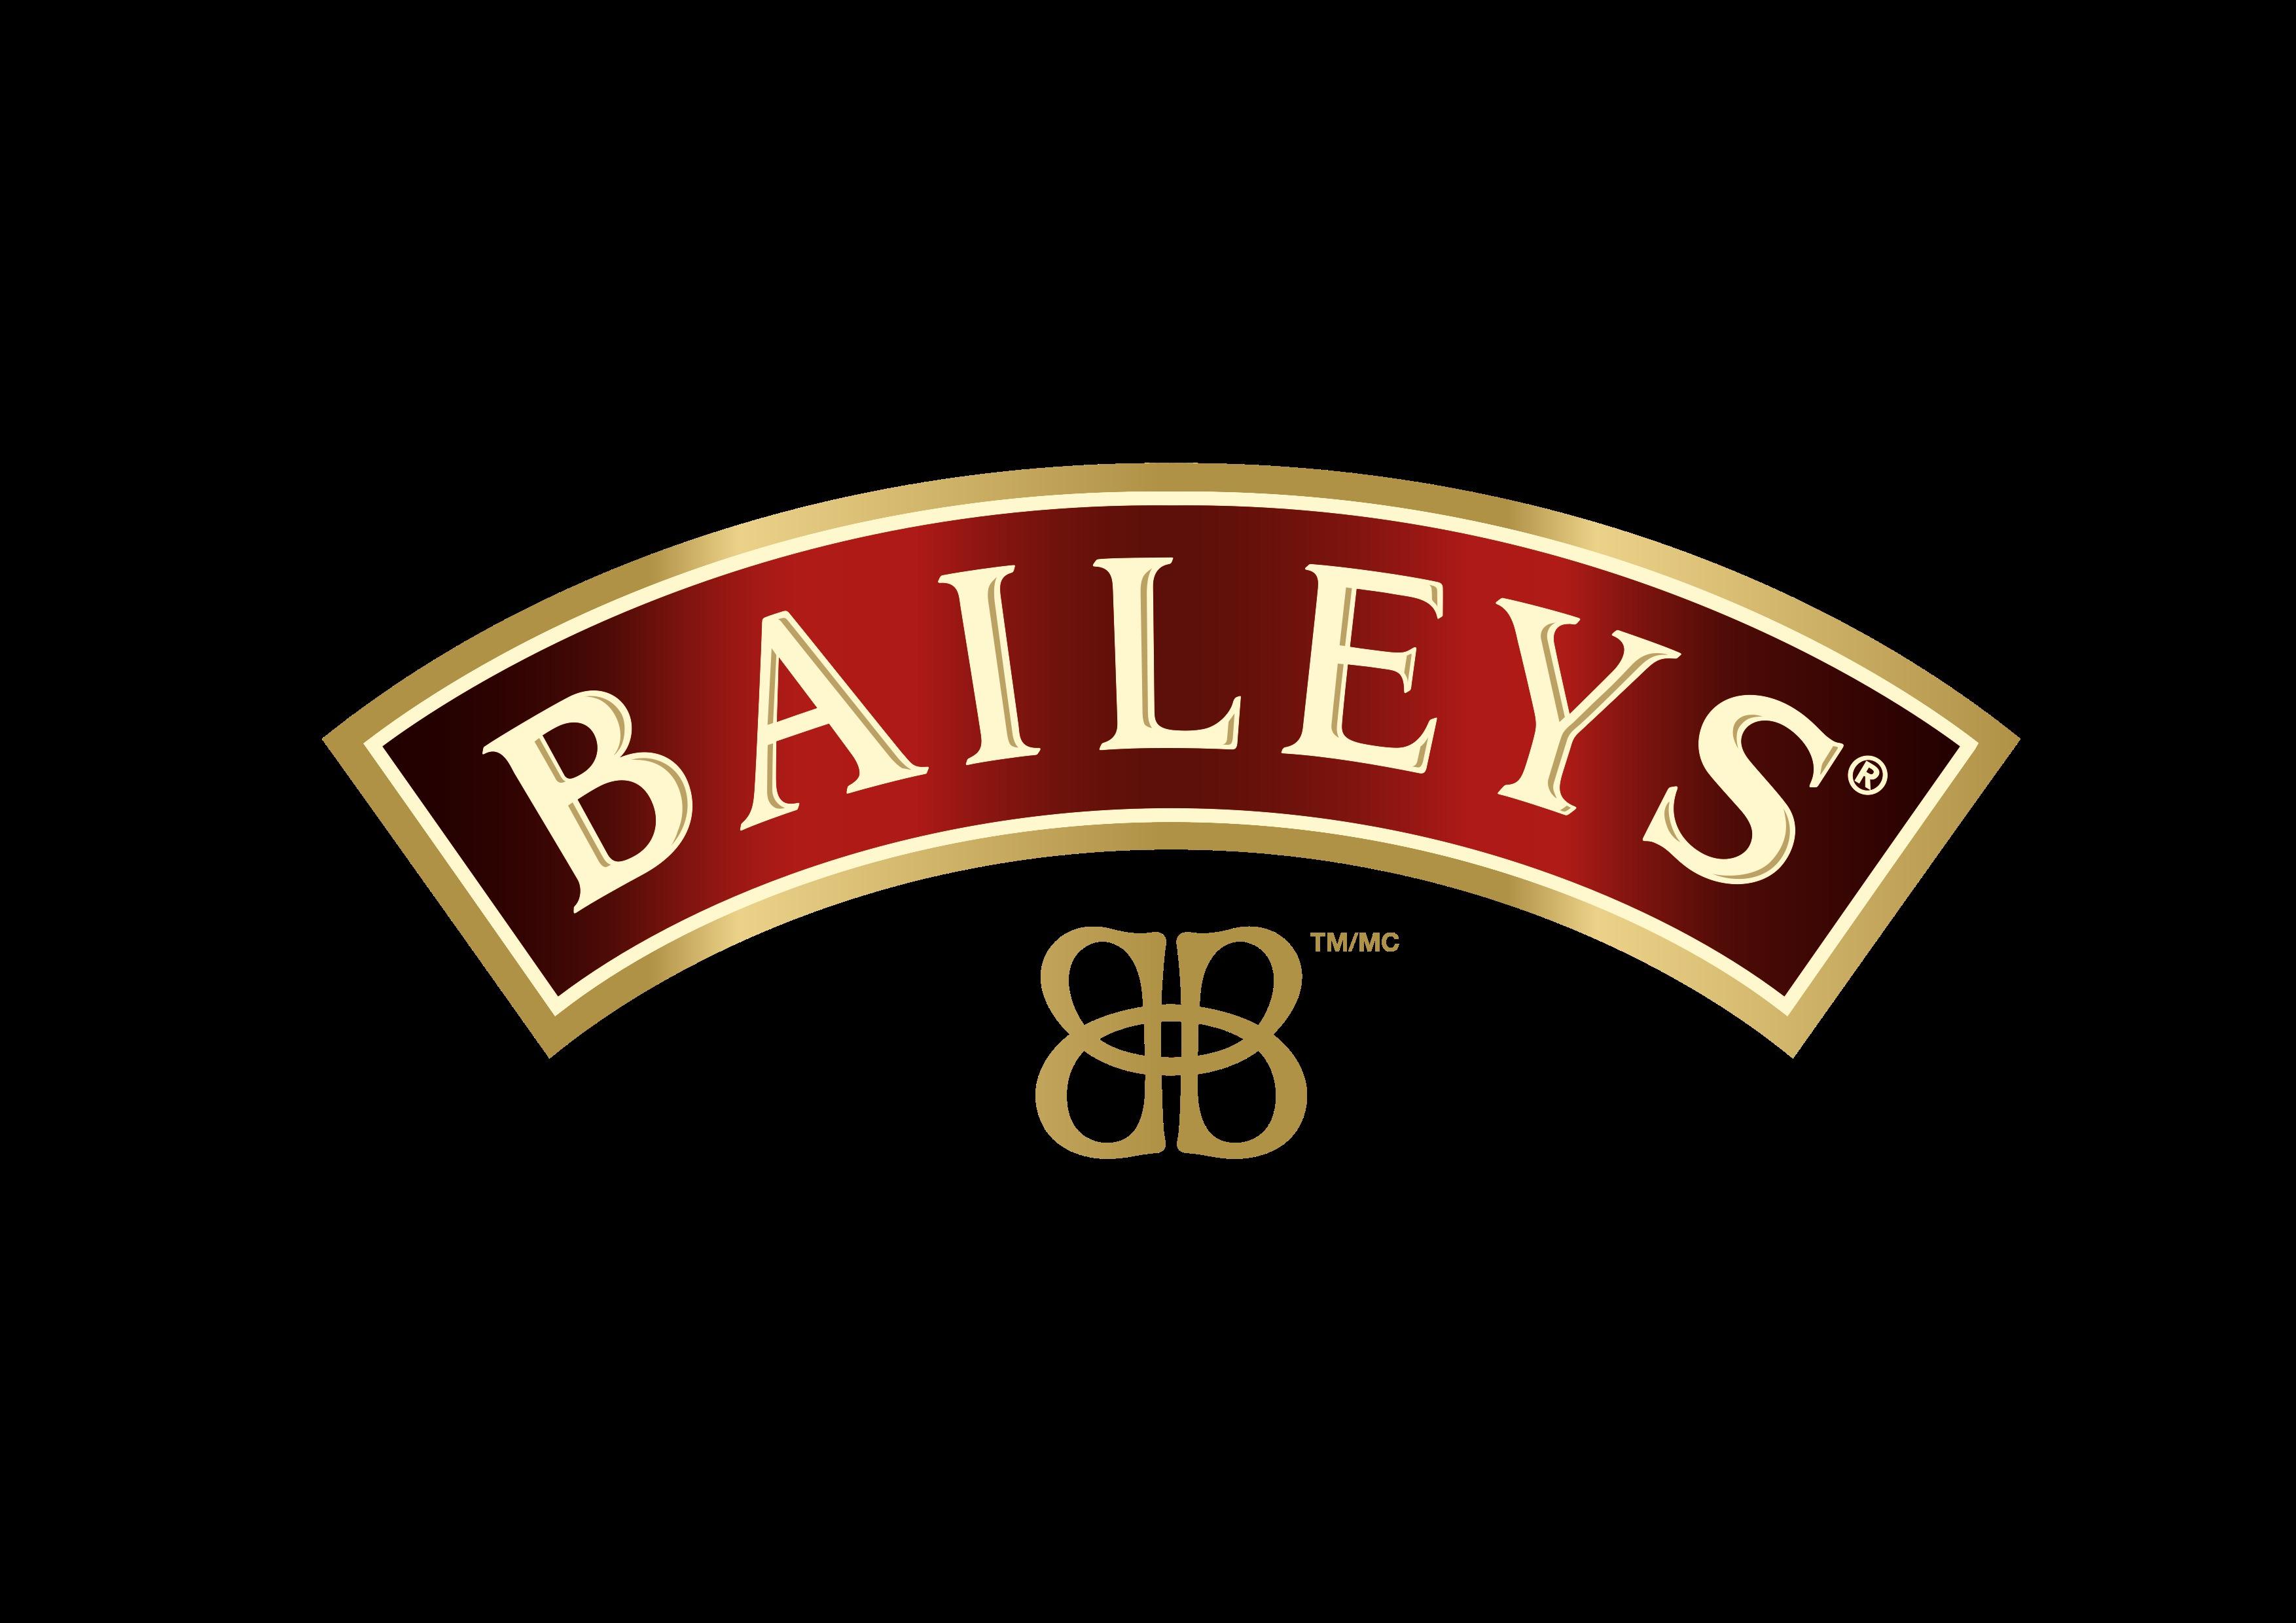 Baileys logo clipart image royalty free stock Baileys Logos image royalty free stock